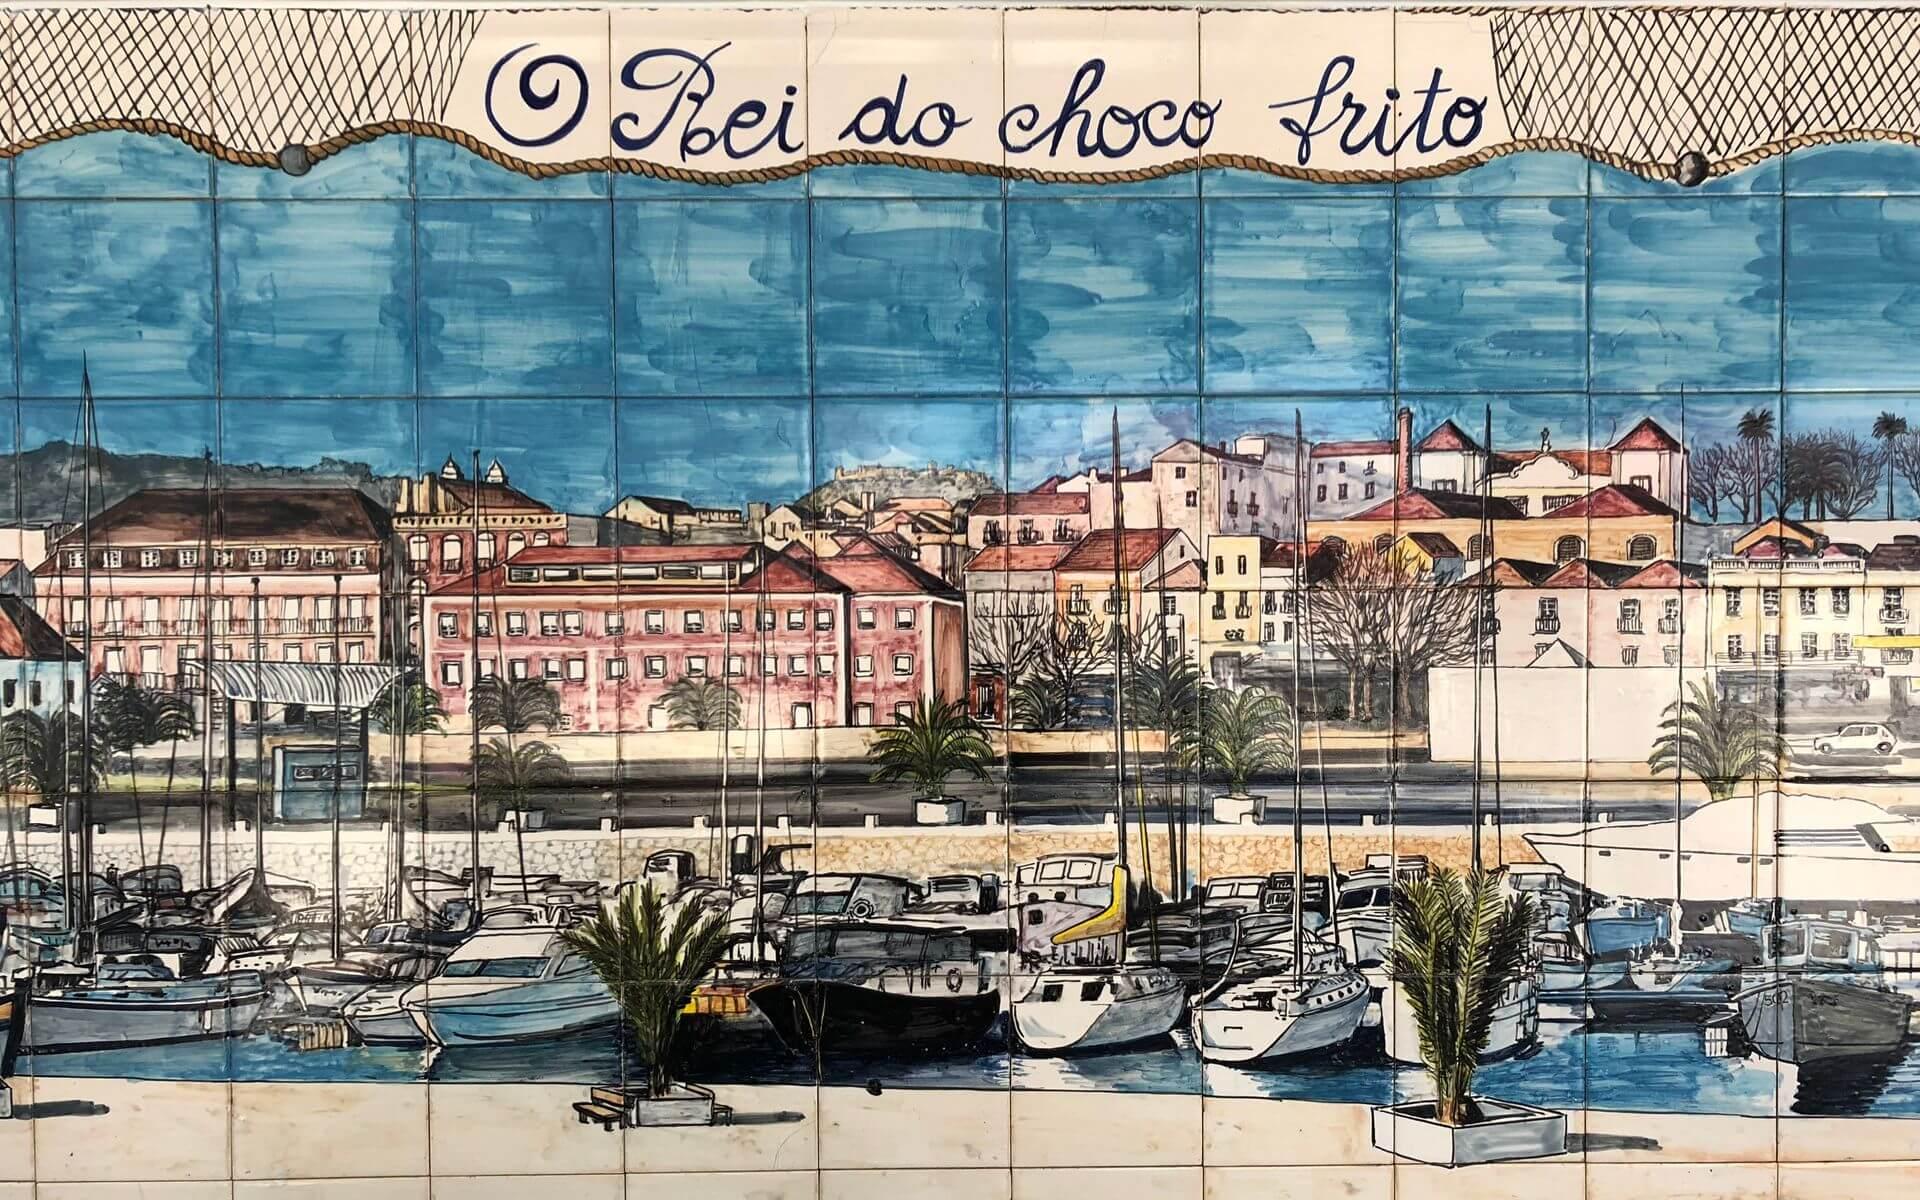 O Rei do Choco Frito - Casa Santiago - Azulejos